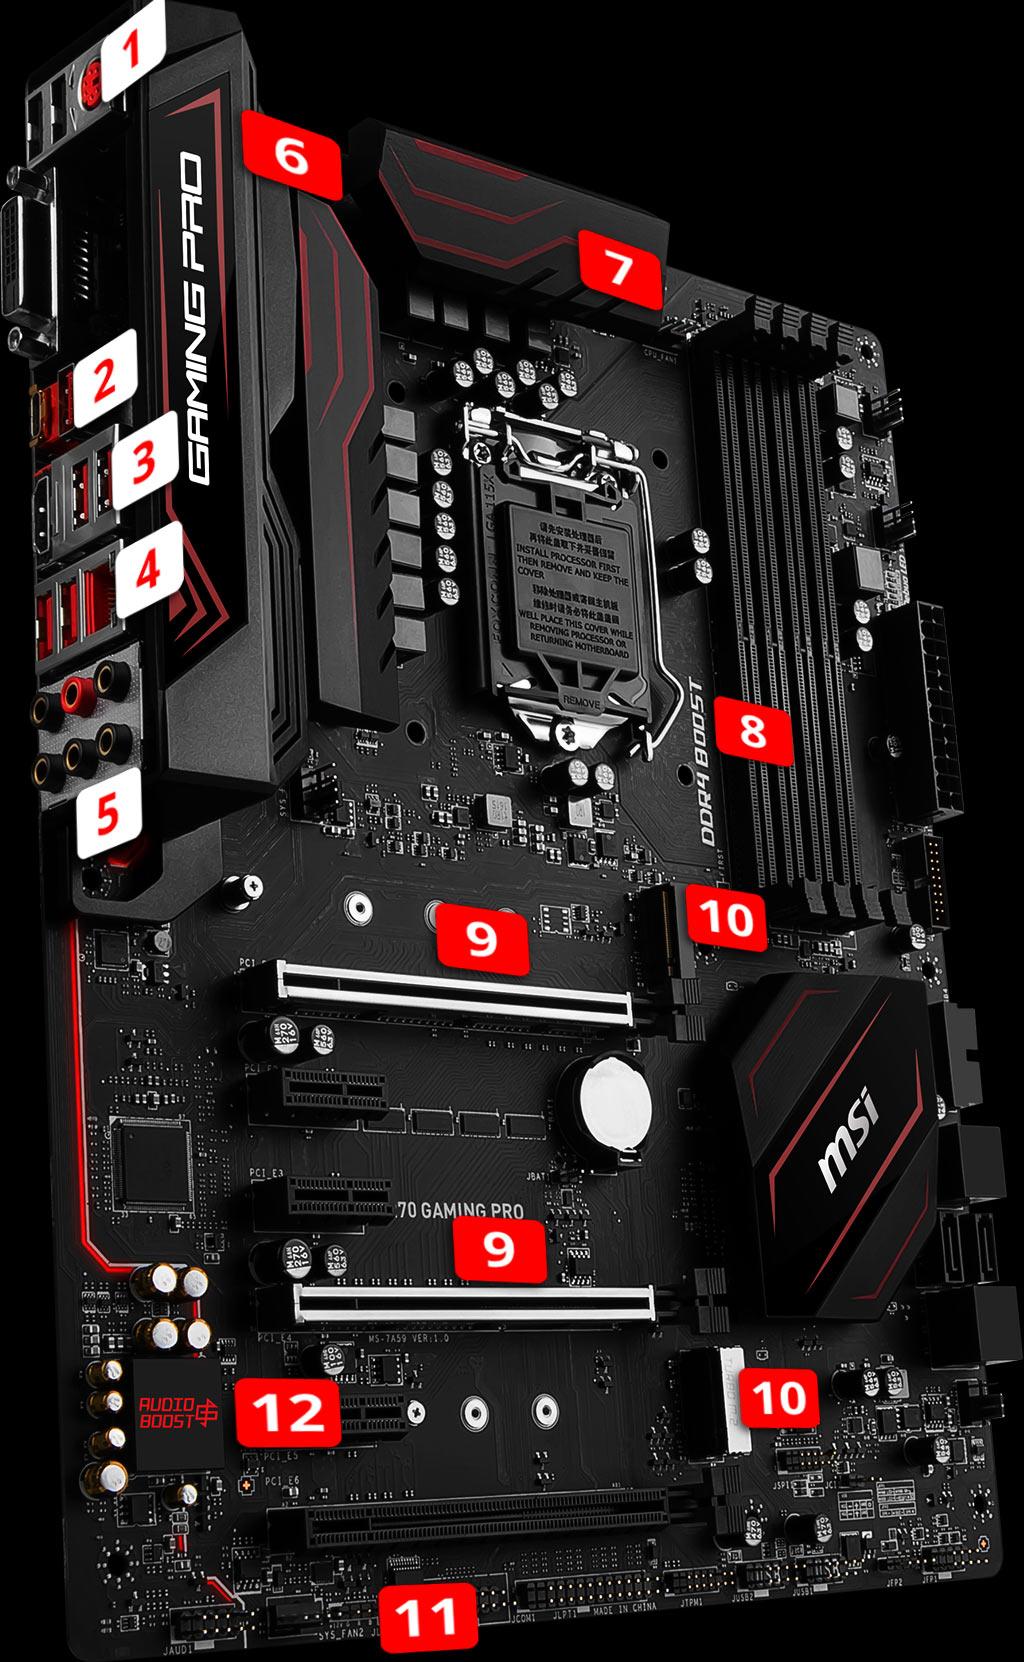 MSI Z270 Gaming Pro LGA1151 ATX Motherboard